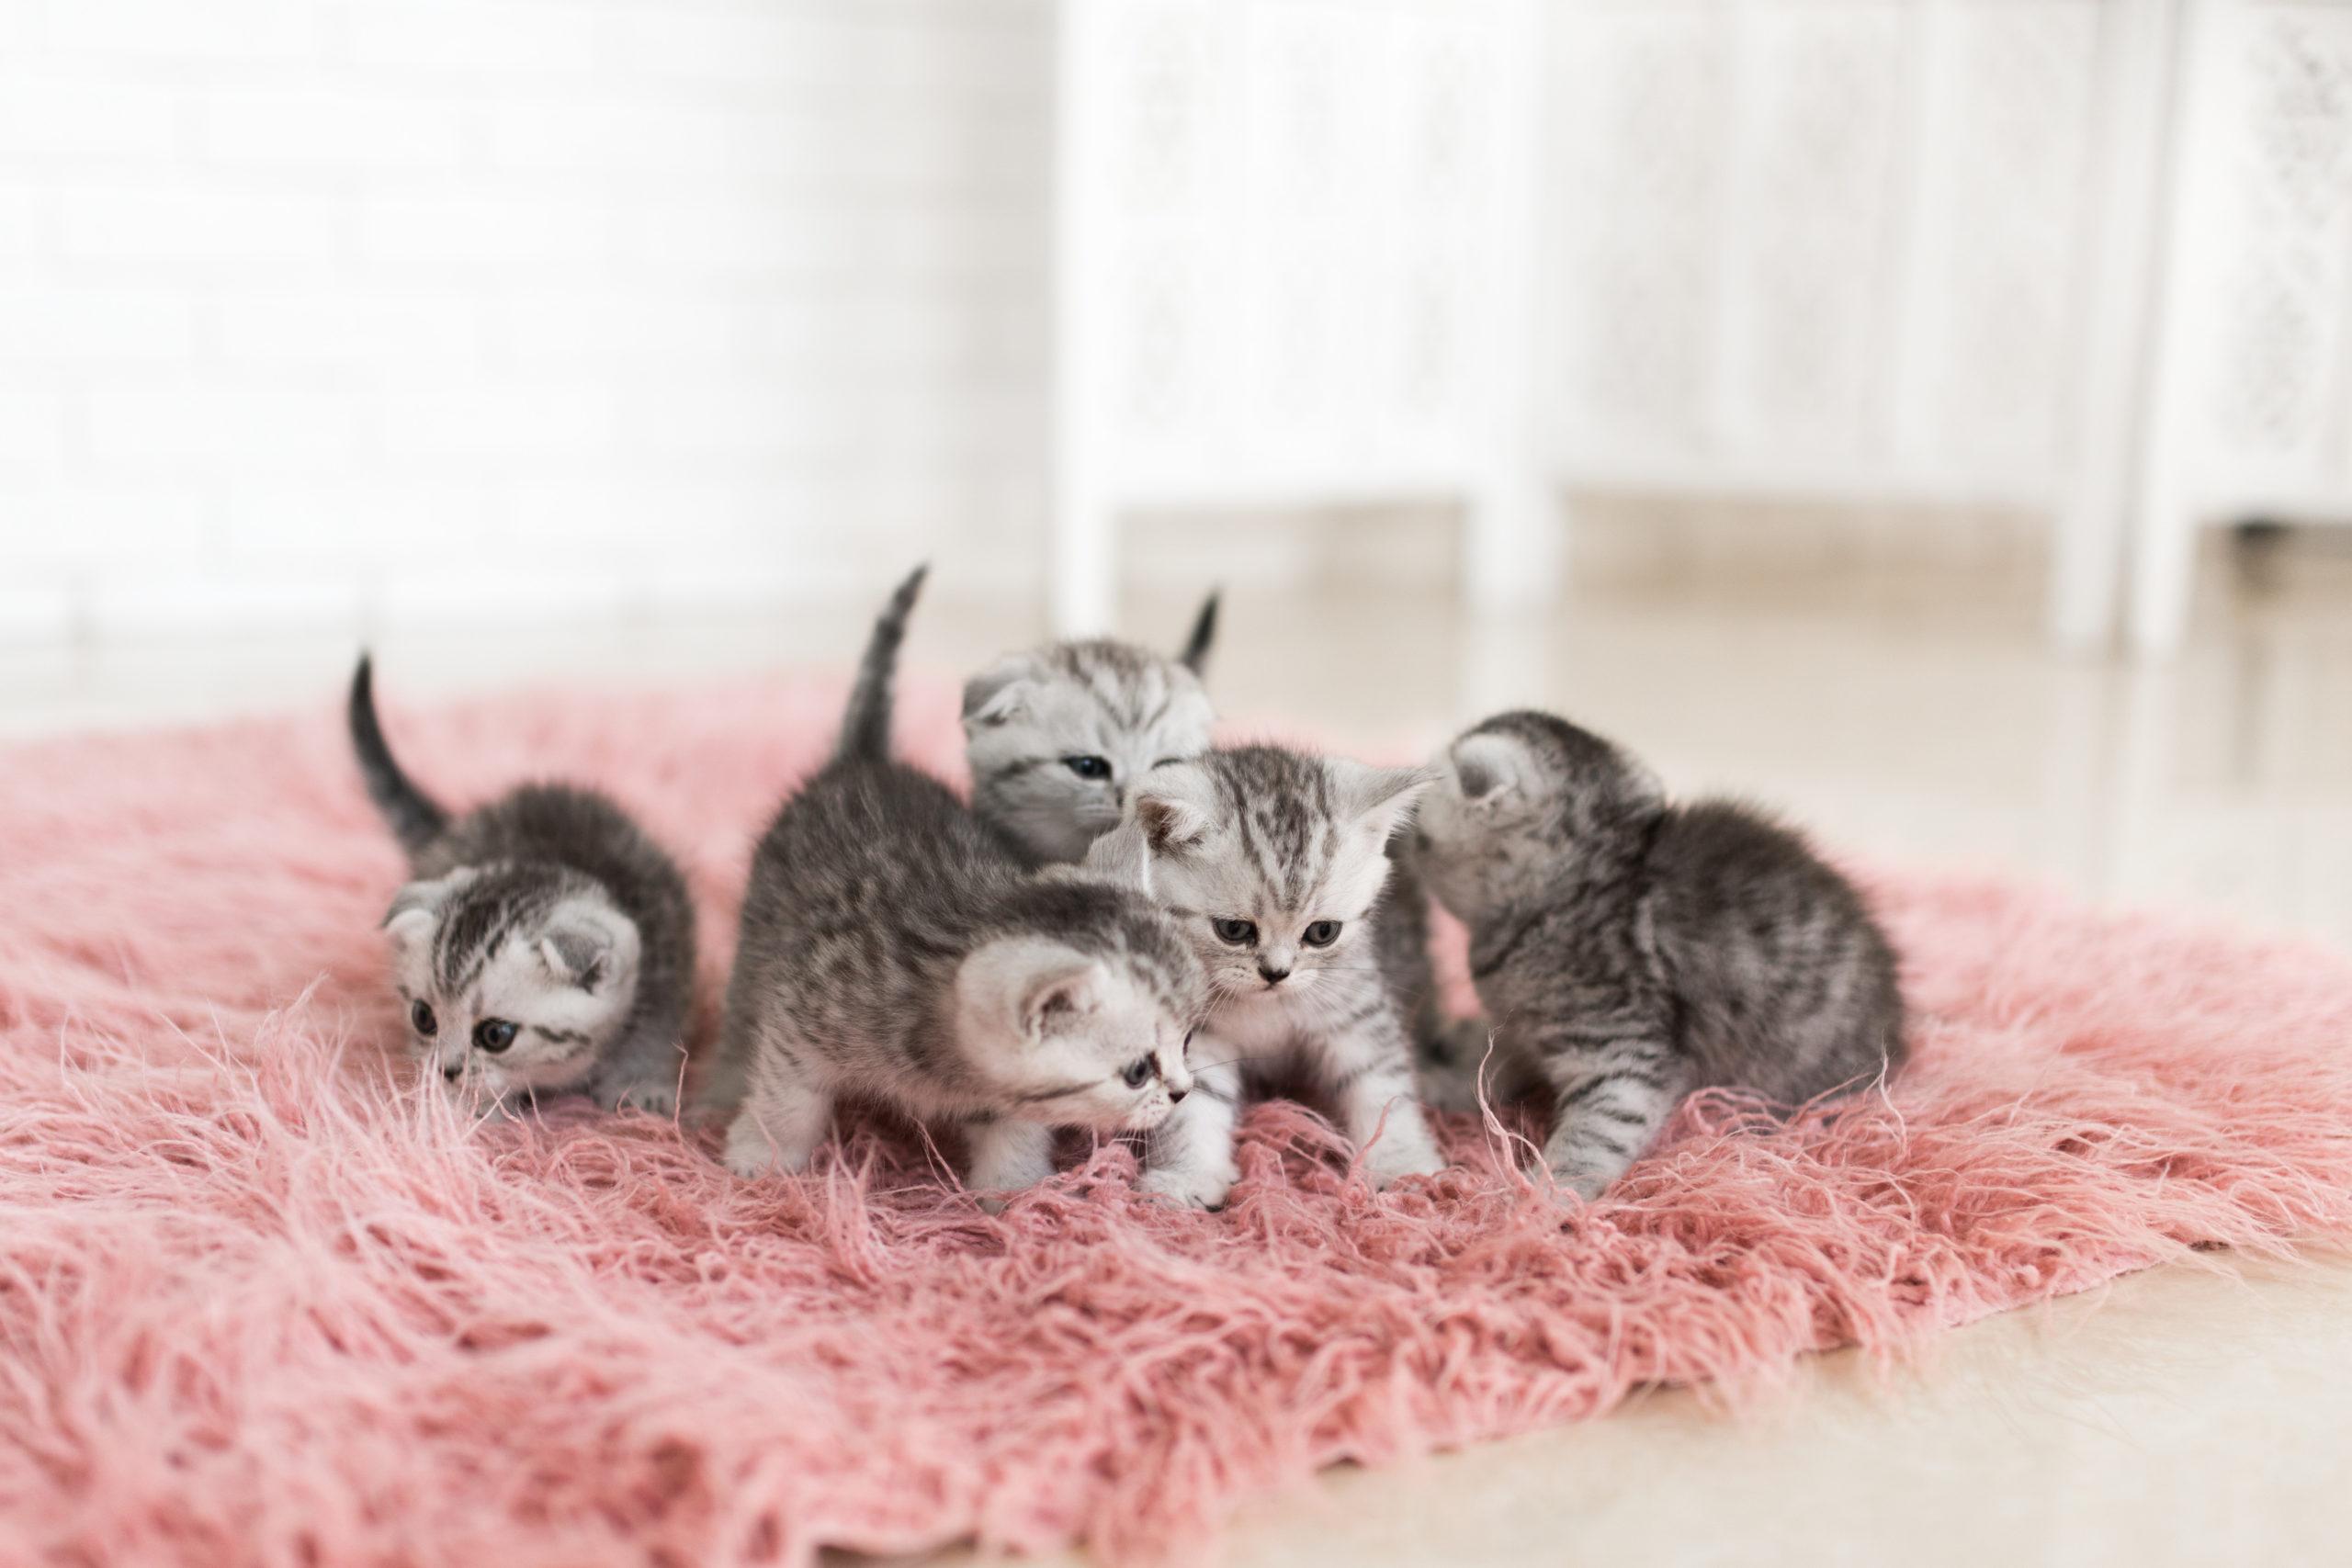 Kedi sahiplenme Rehberi - Petarkadas.com